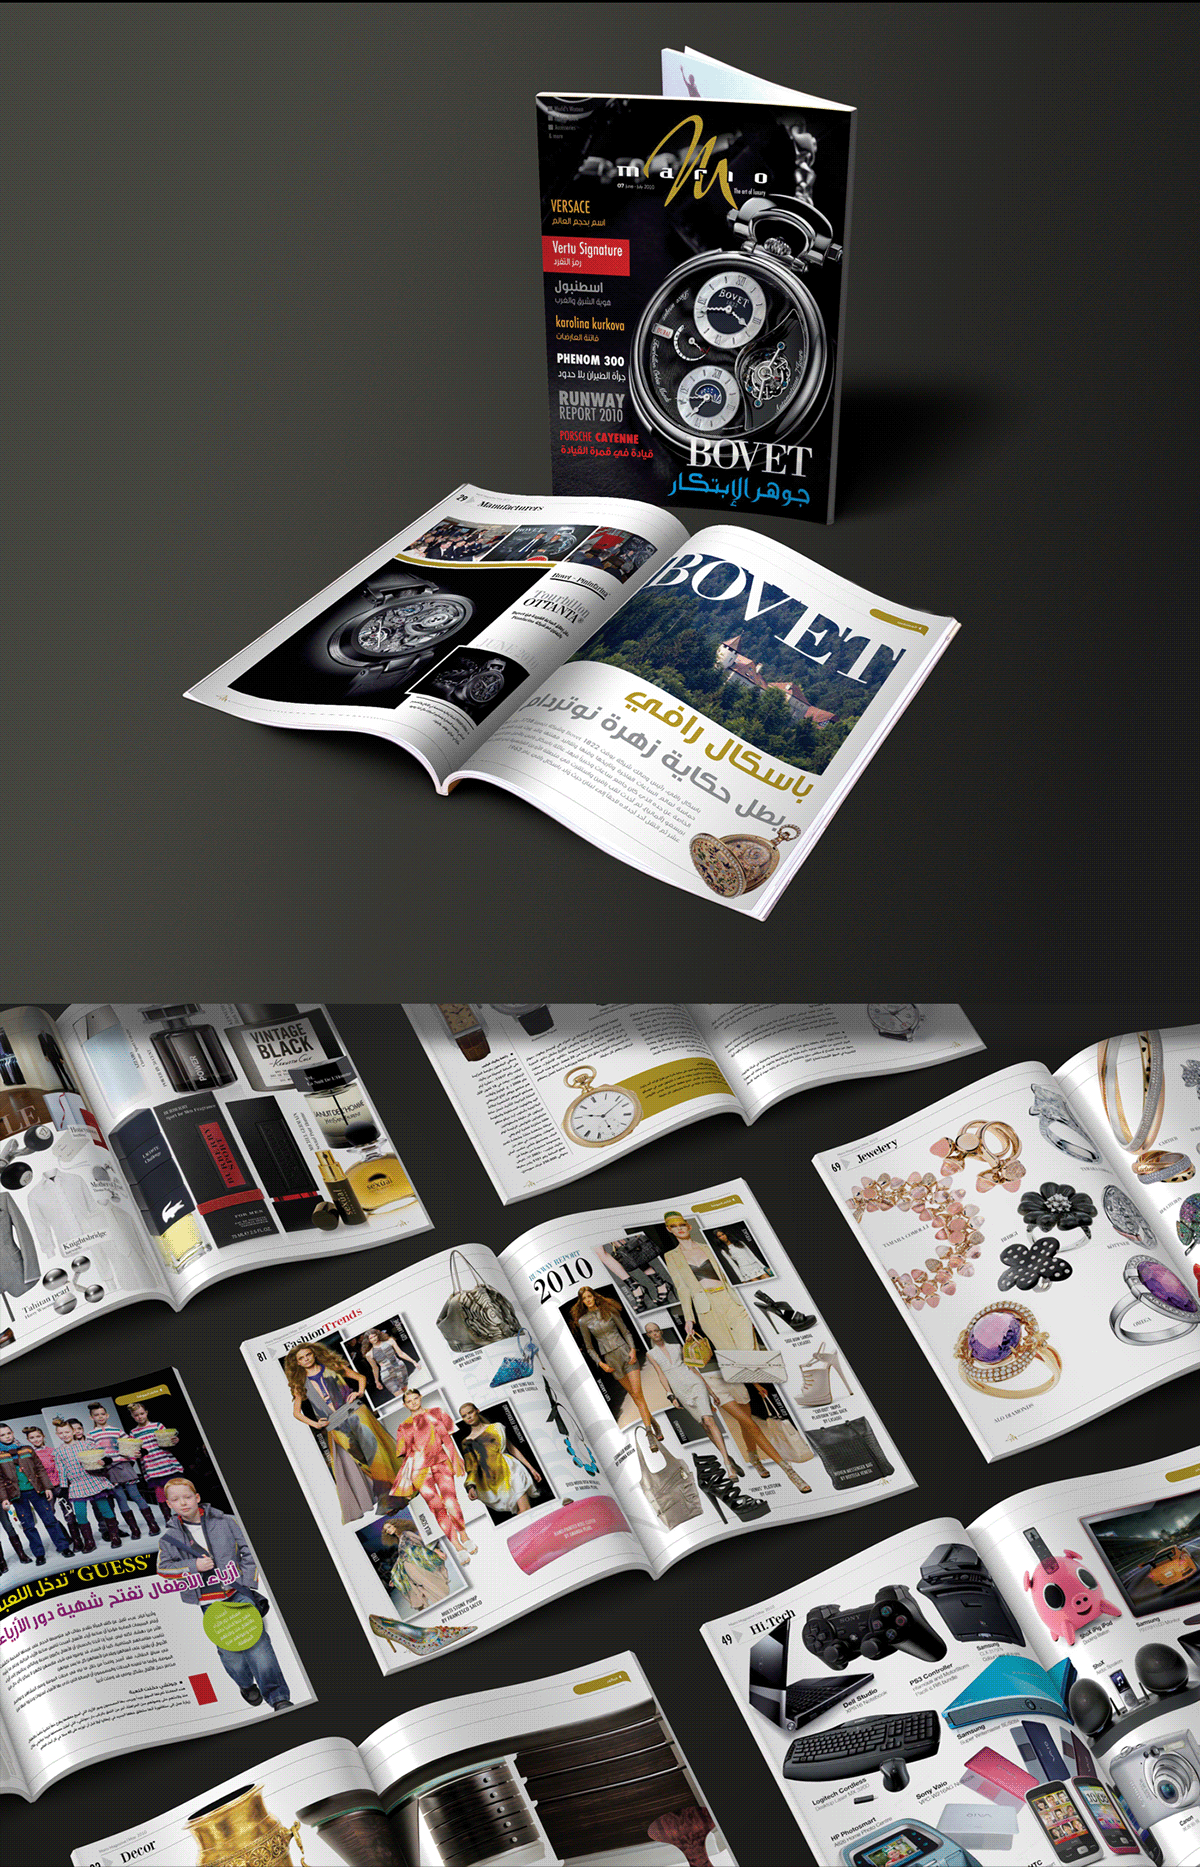 Advertising  branding  design jewelry Layout luxury magazine Mockup visual identity Watches